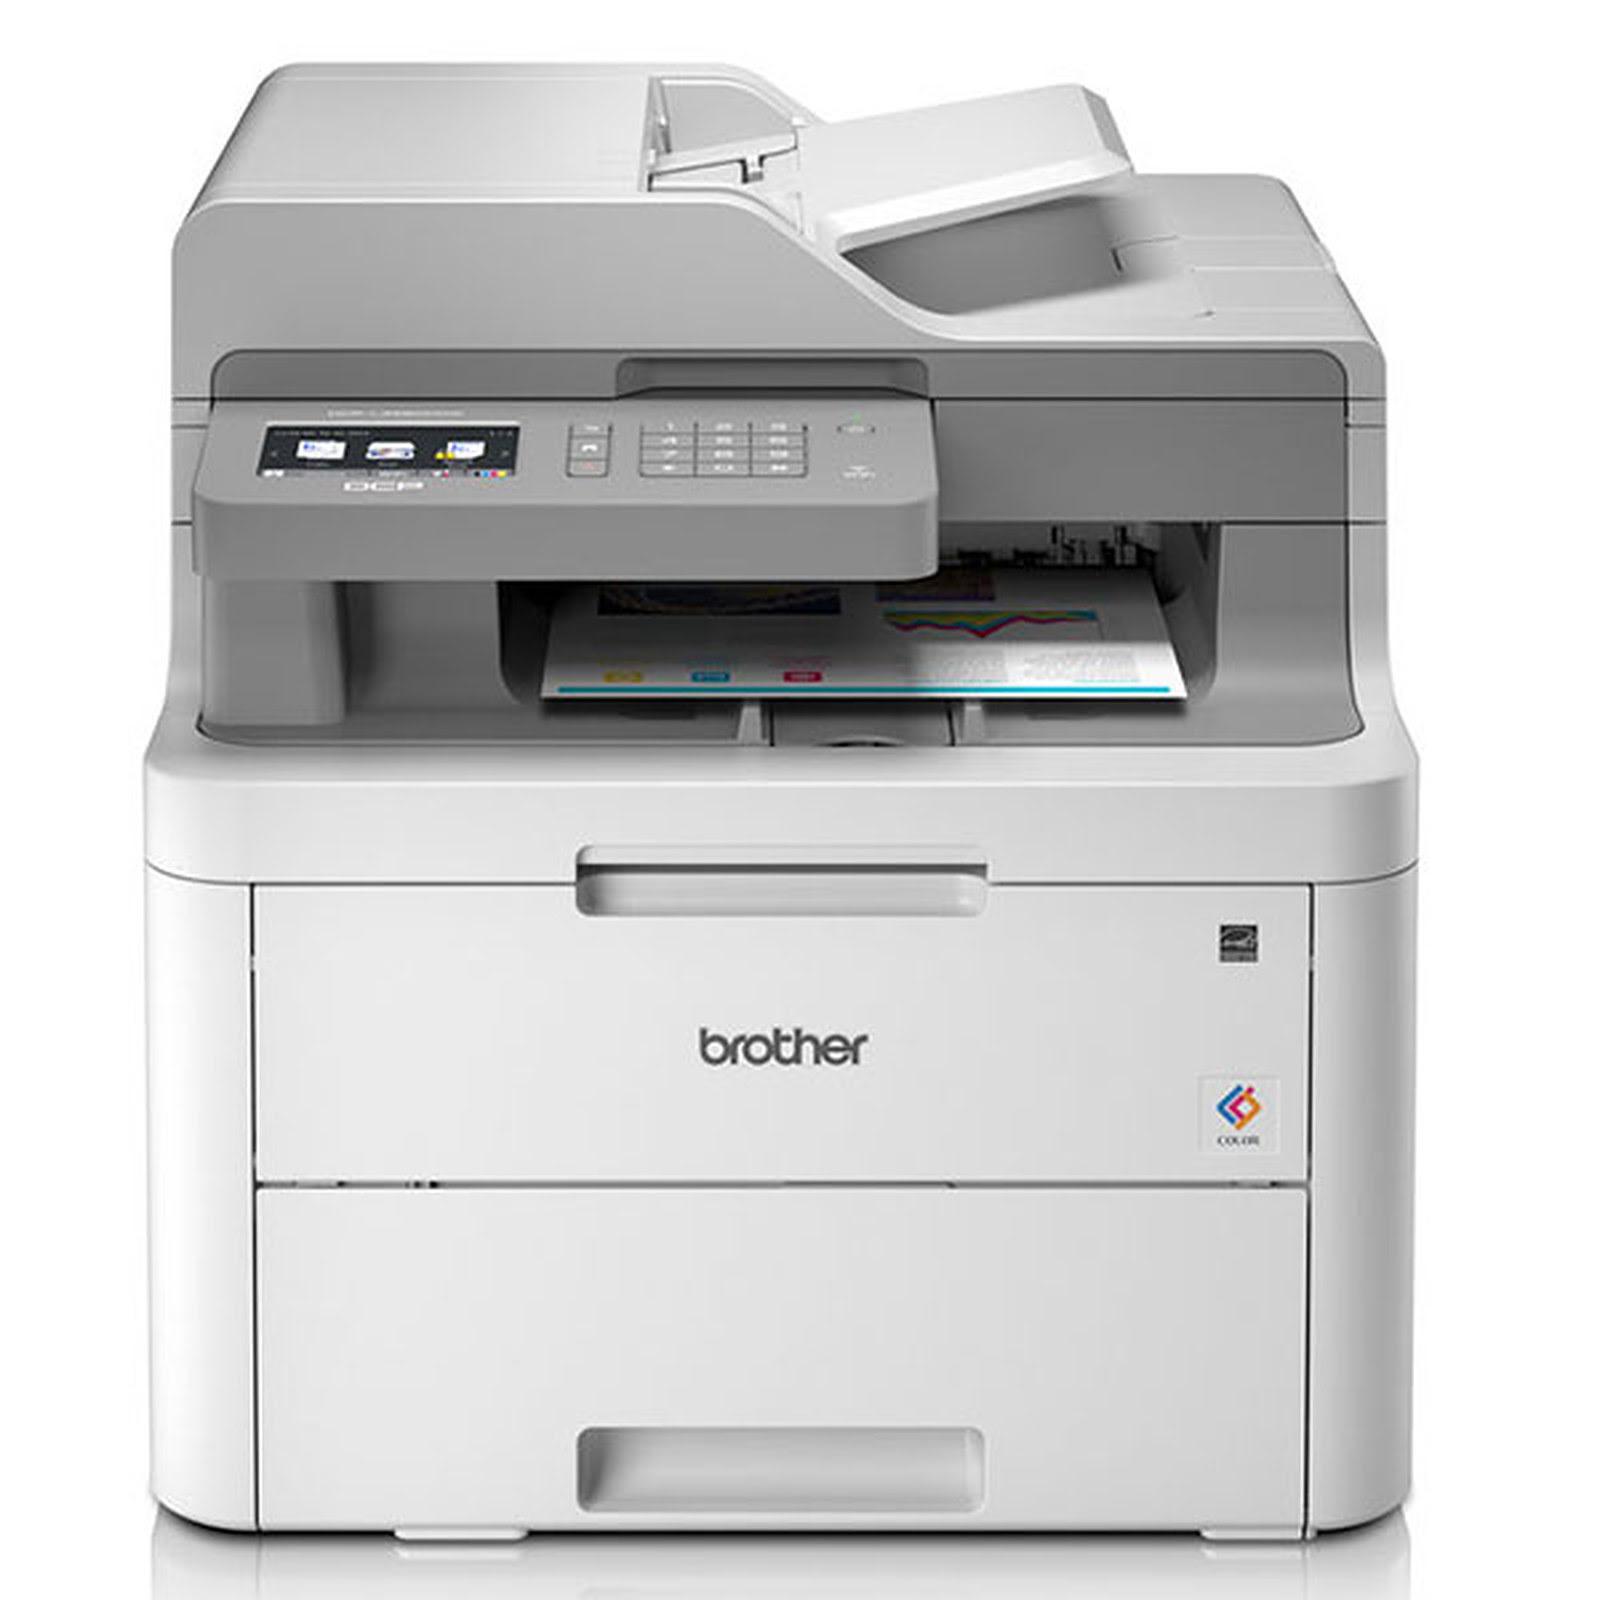 Imprimante multifonction Brother DCP-L3550CDW - Cybertek.fr - 0